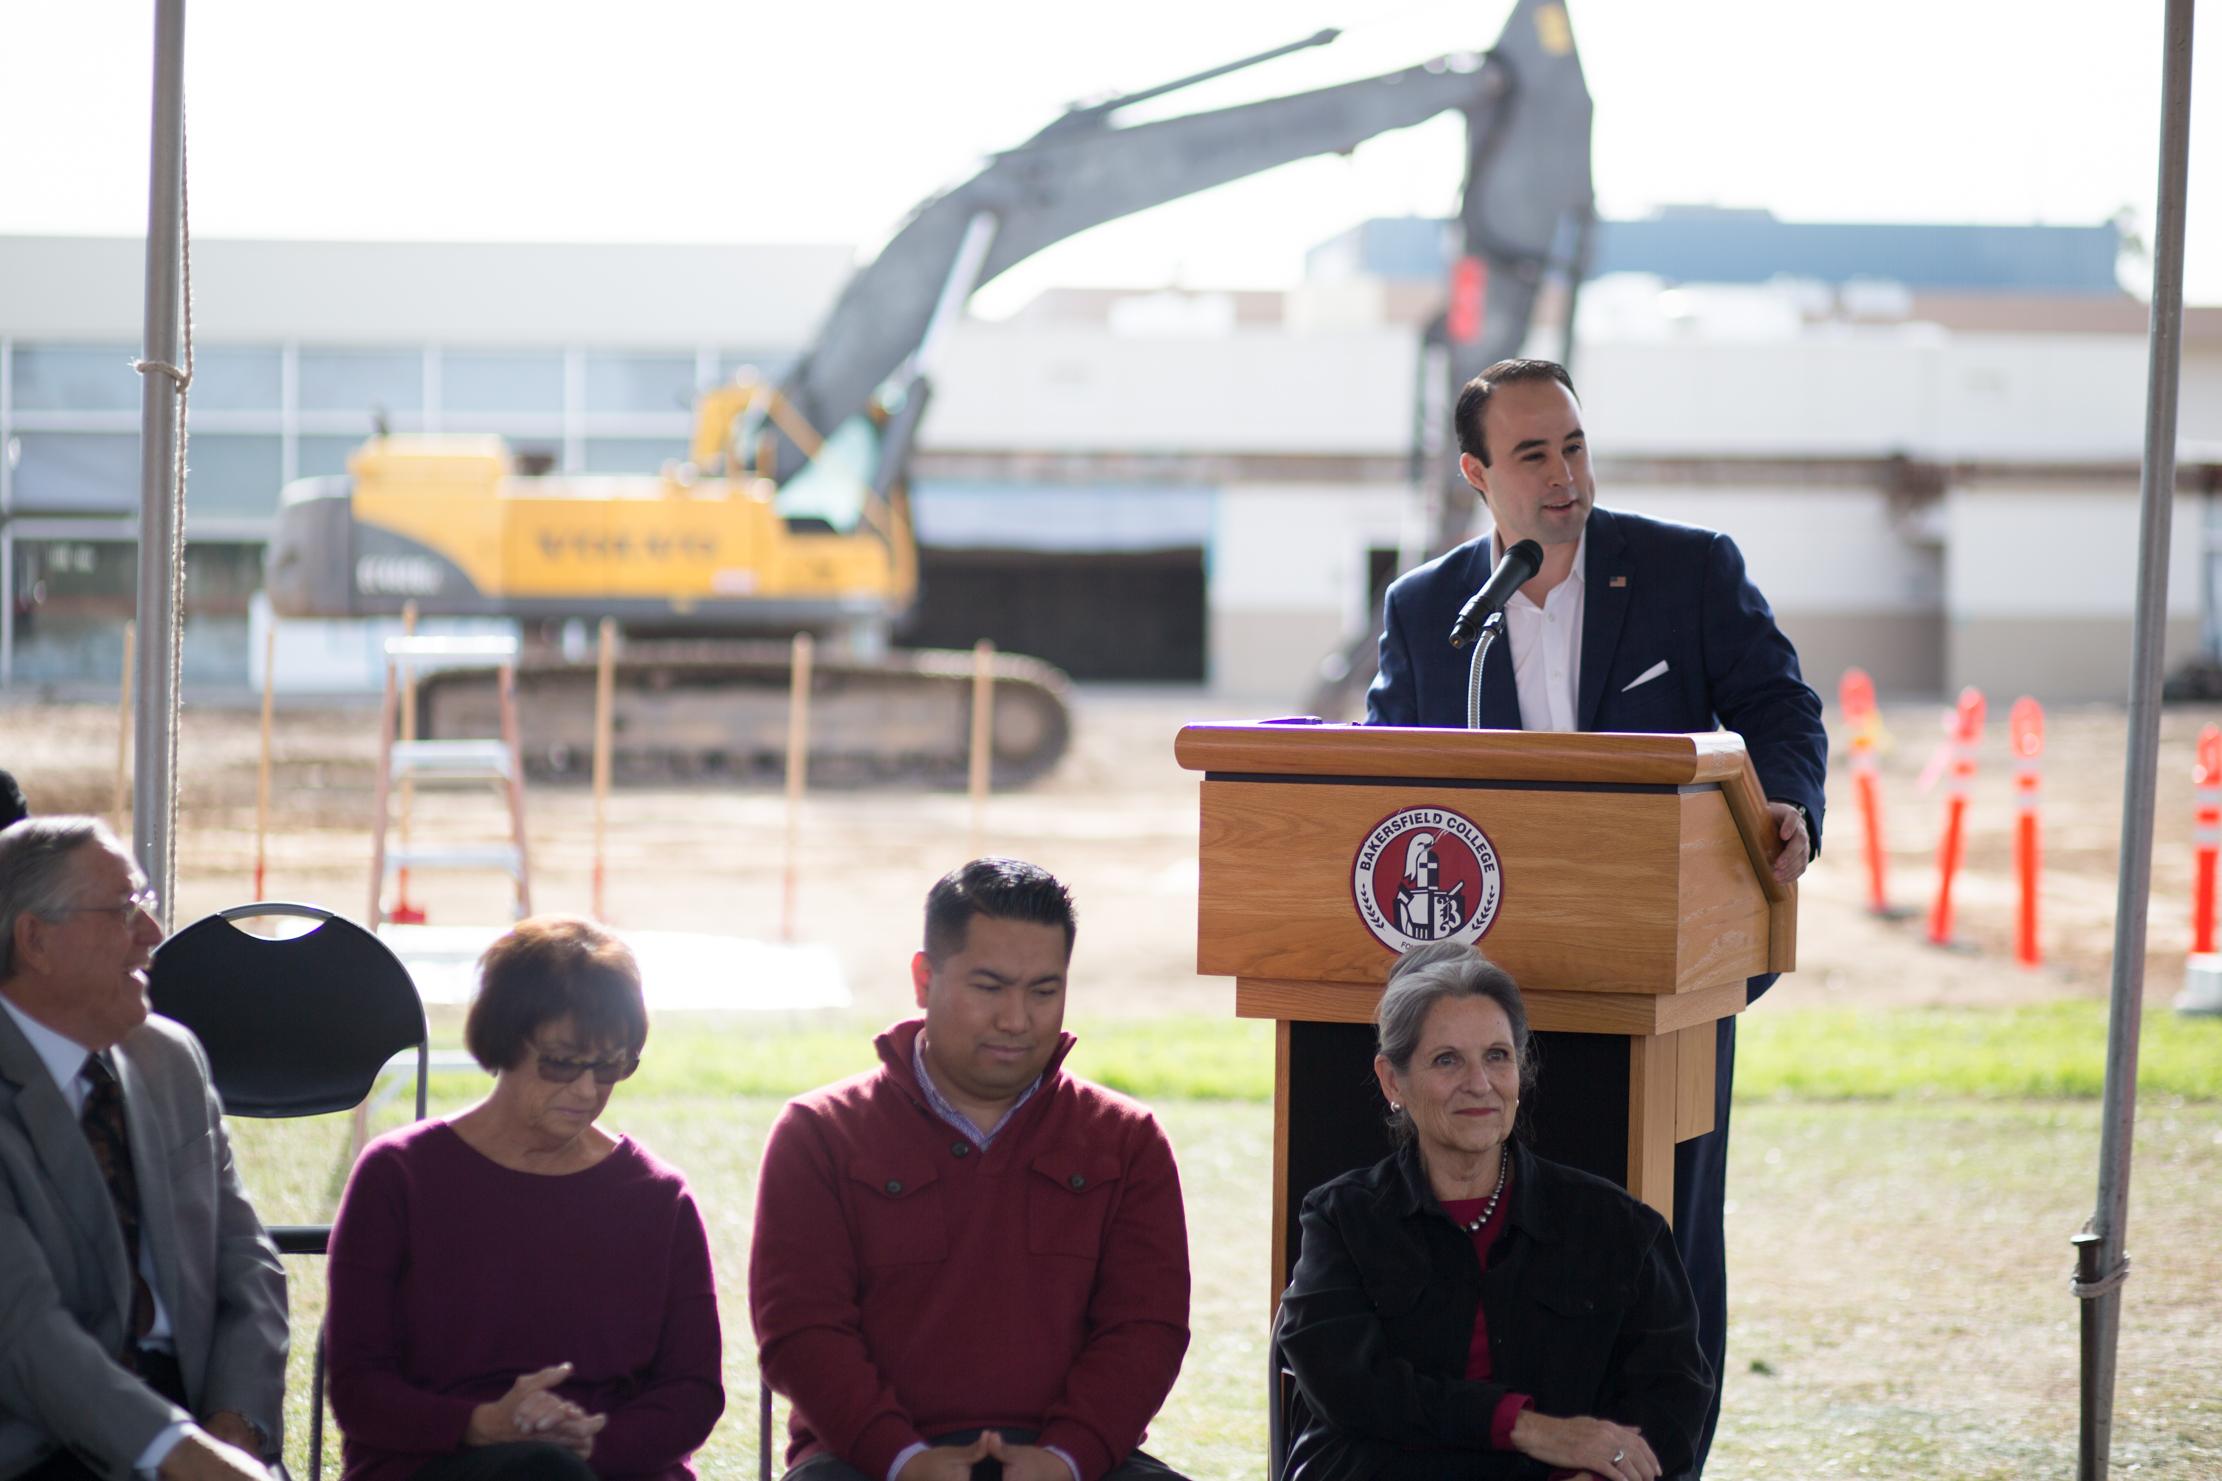 former BCSGA president Alex Dominguez speaks at the podium